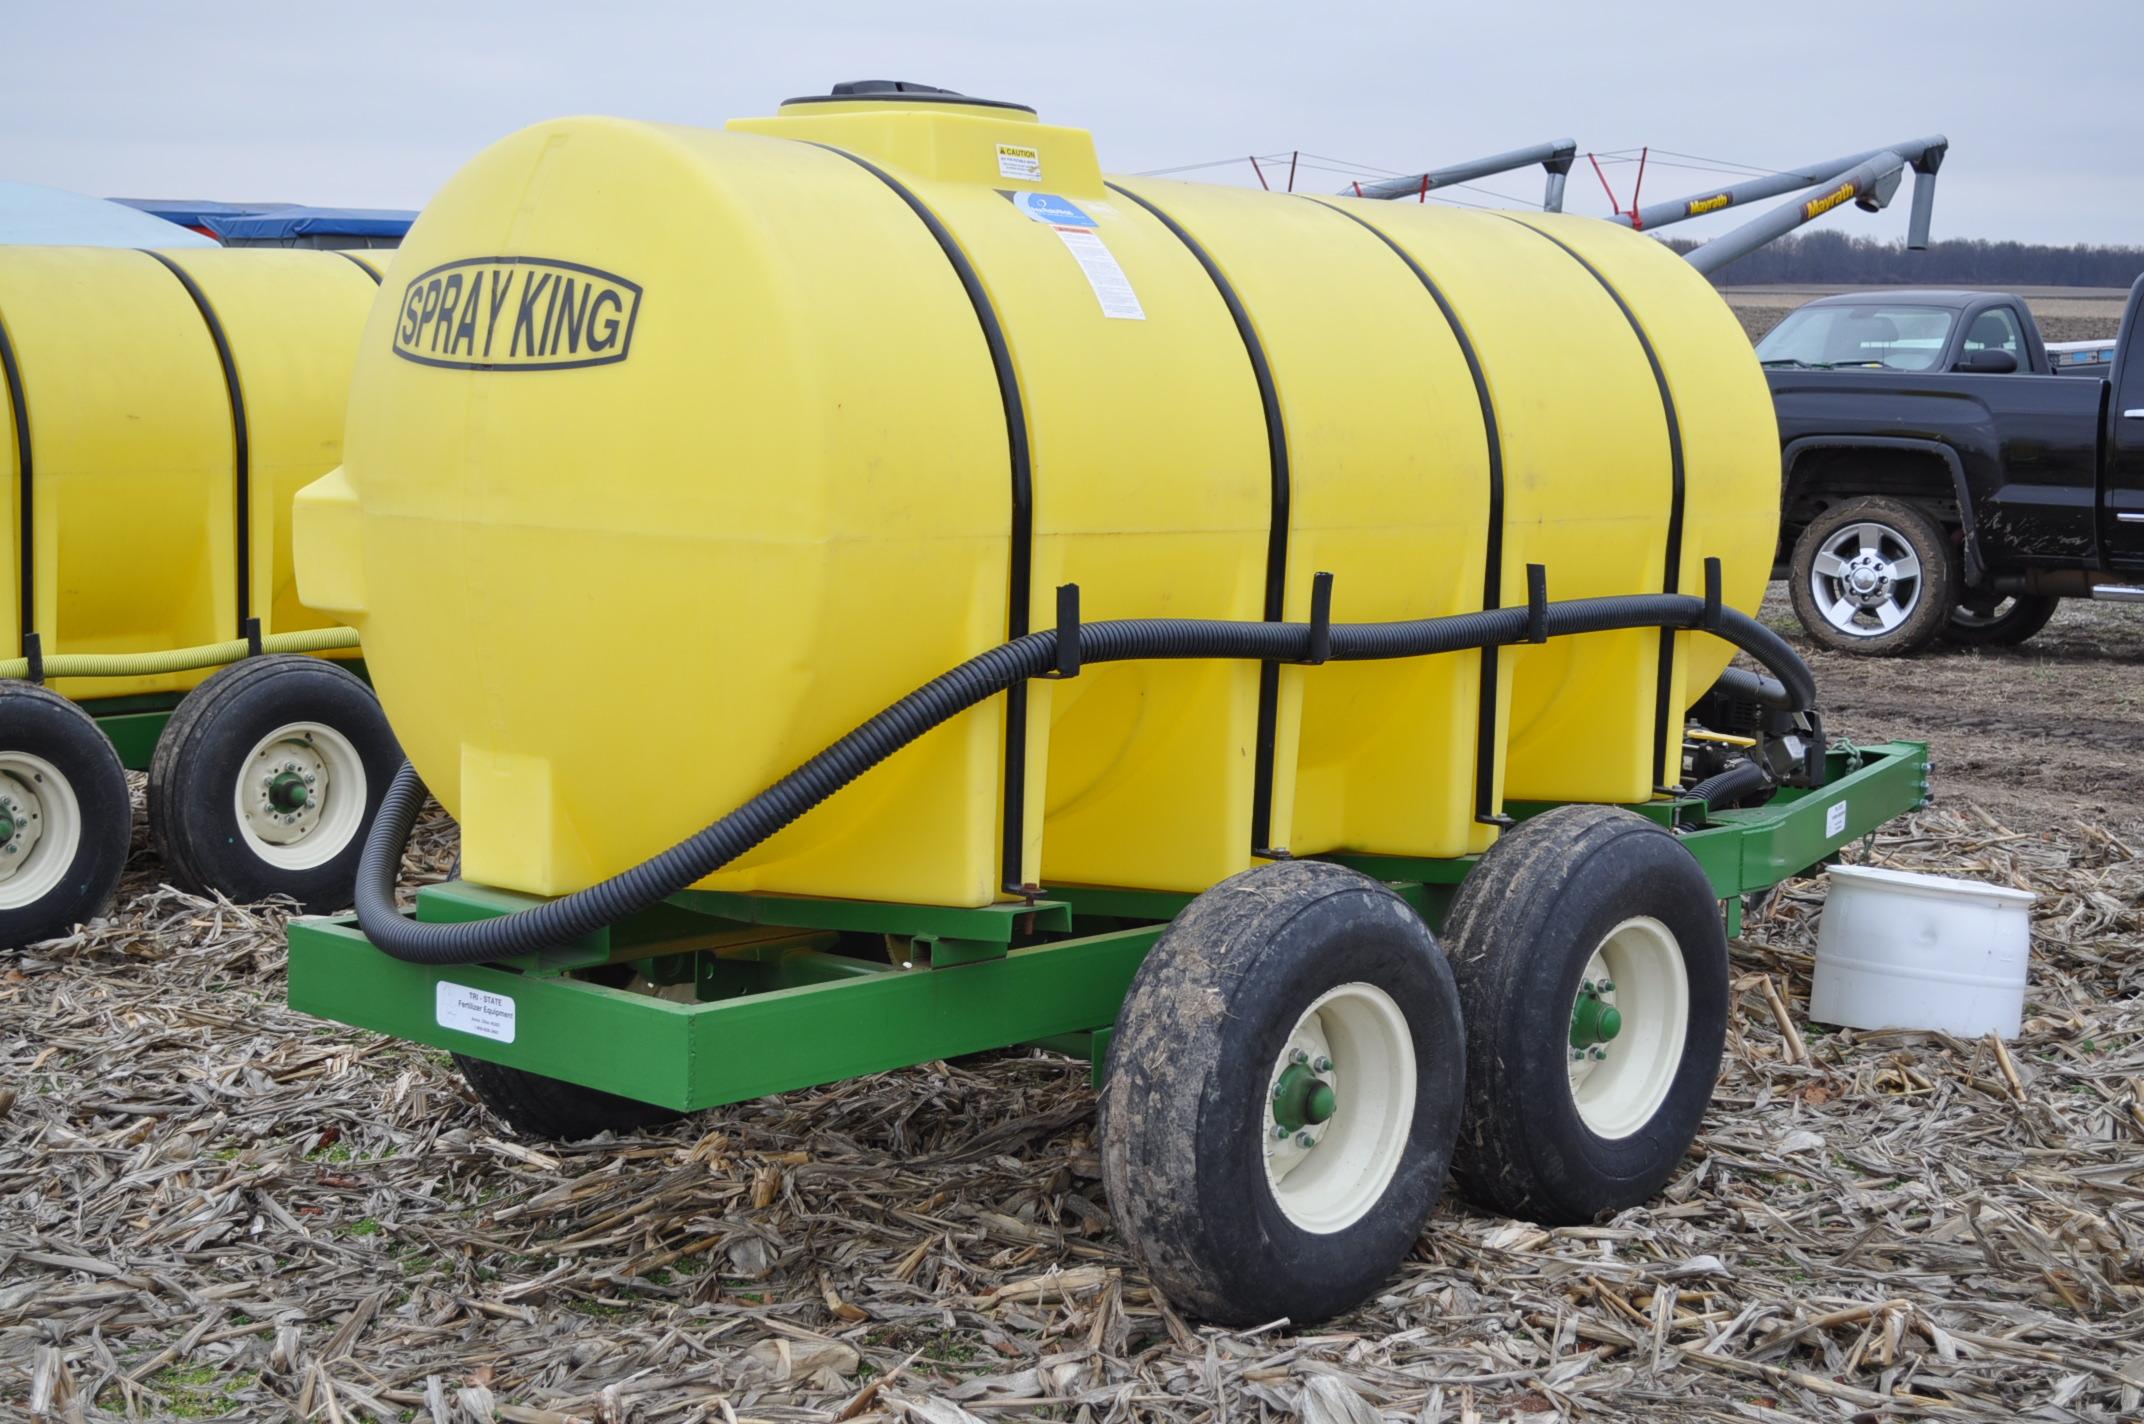 "1000 gallon Spray King tender trailer, tandem axle, 2"" Briggs & Stratton engine, 11L-15 tires - Image 3 of 12"